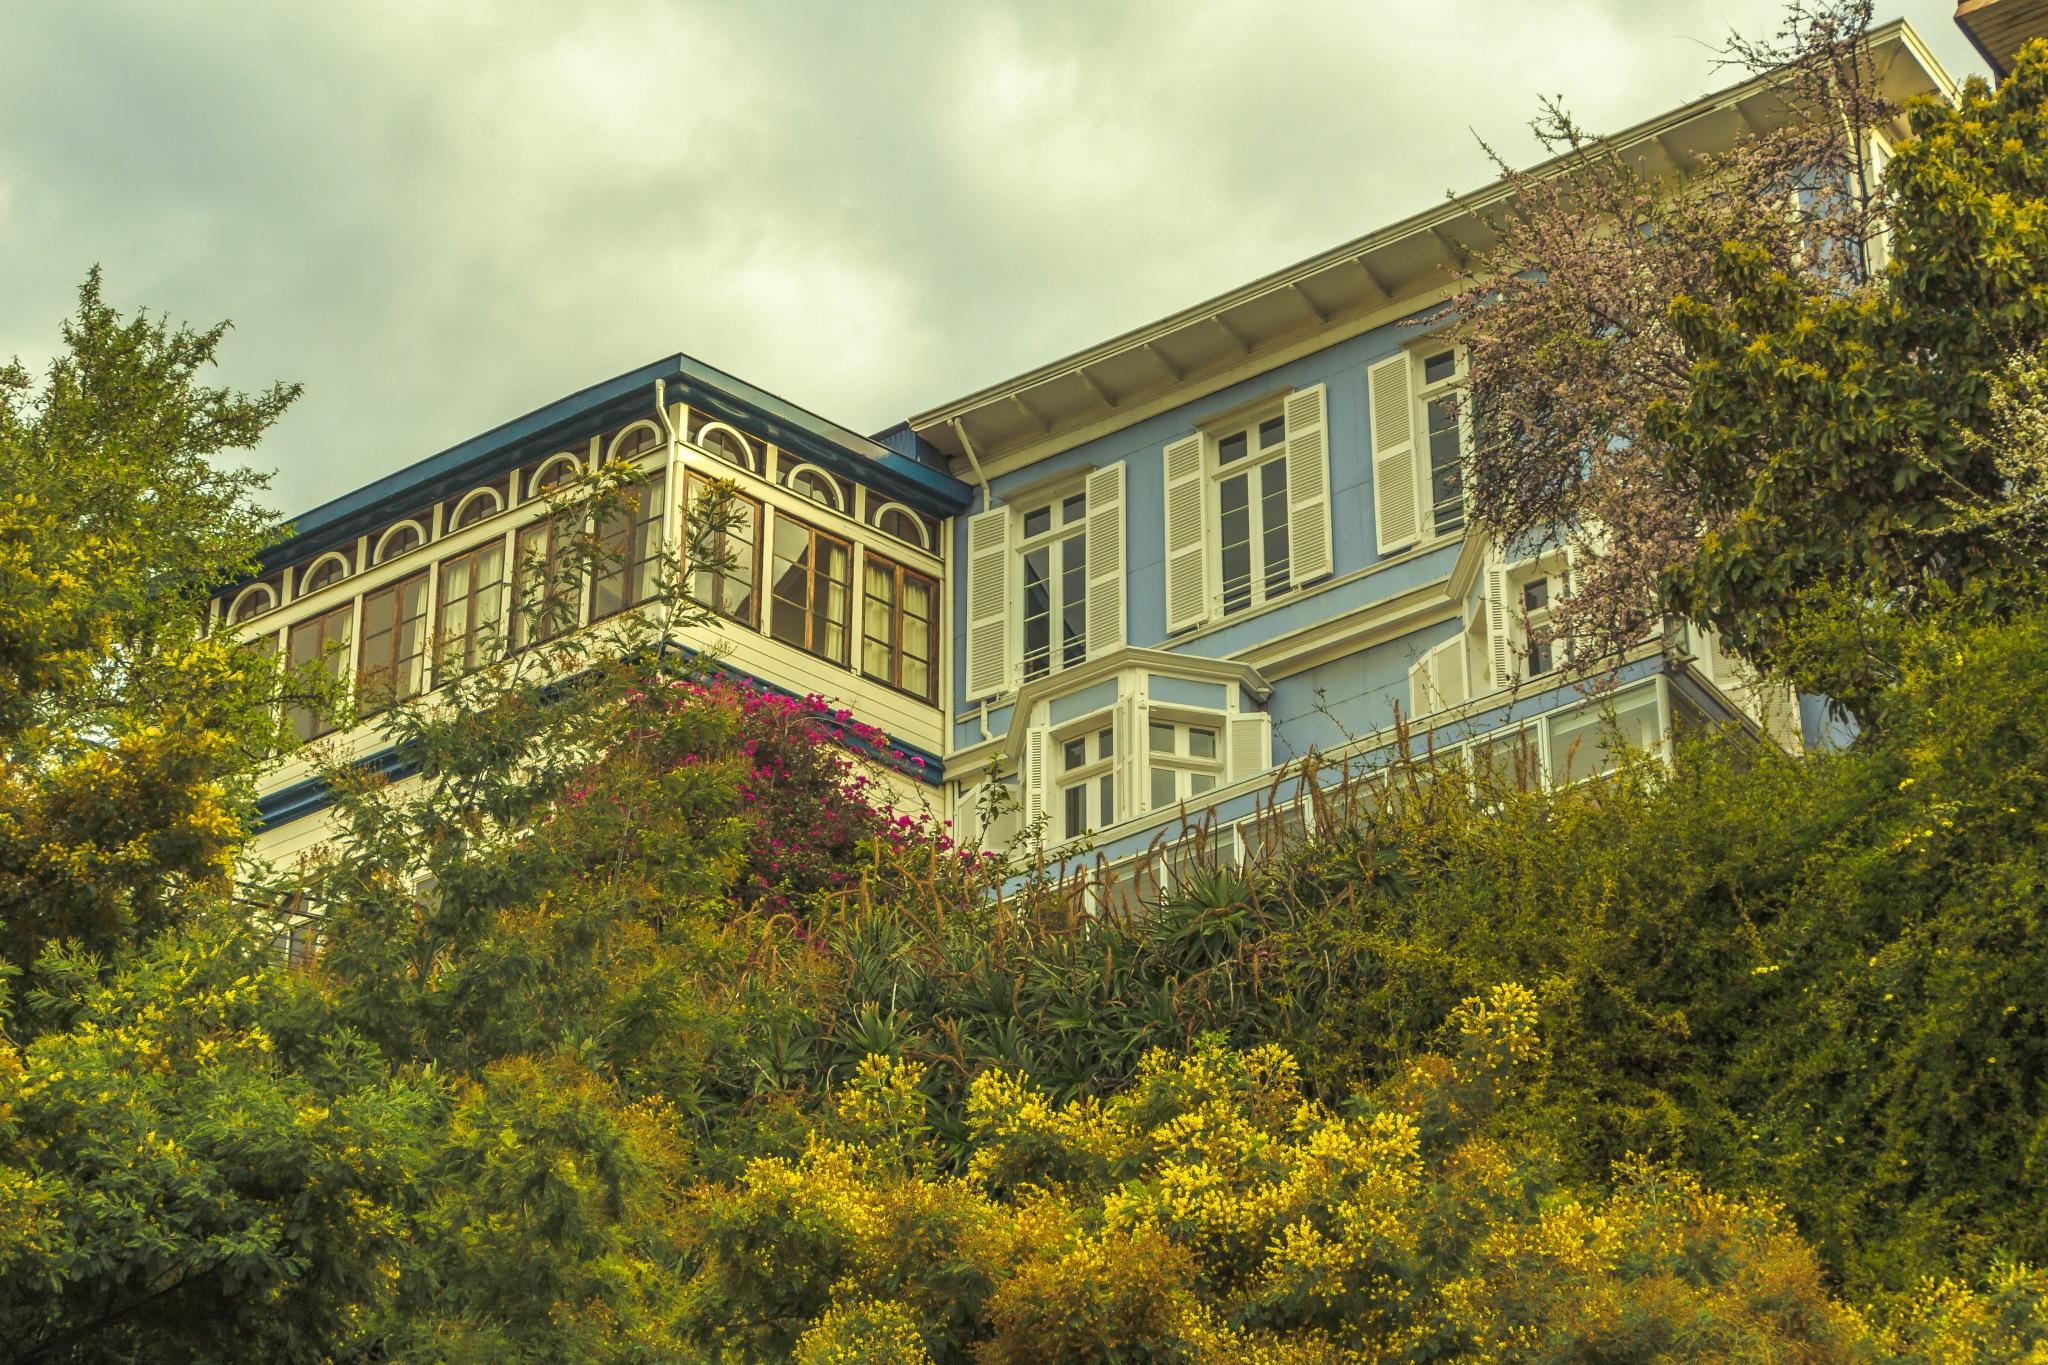 Valparaiso by ecamus